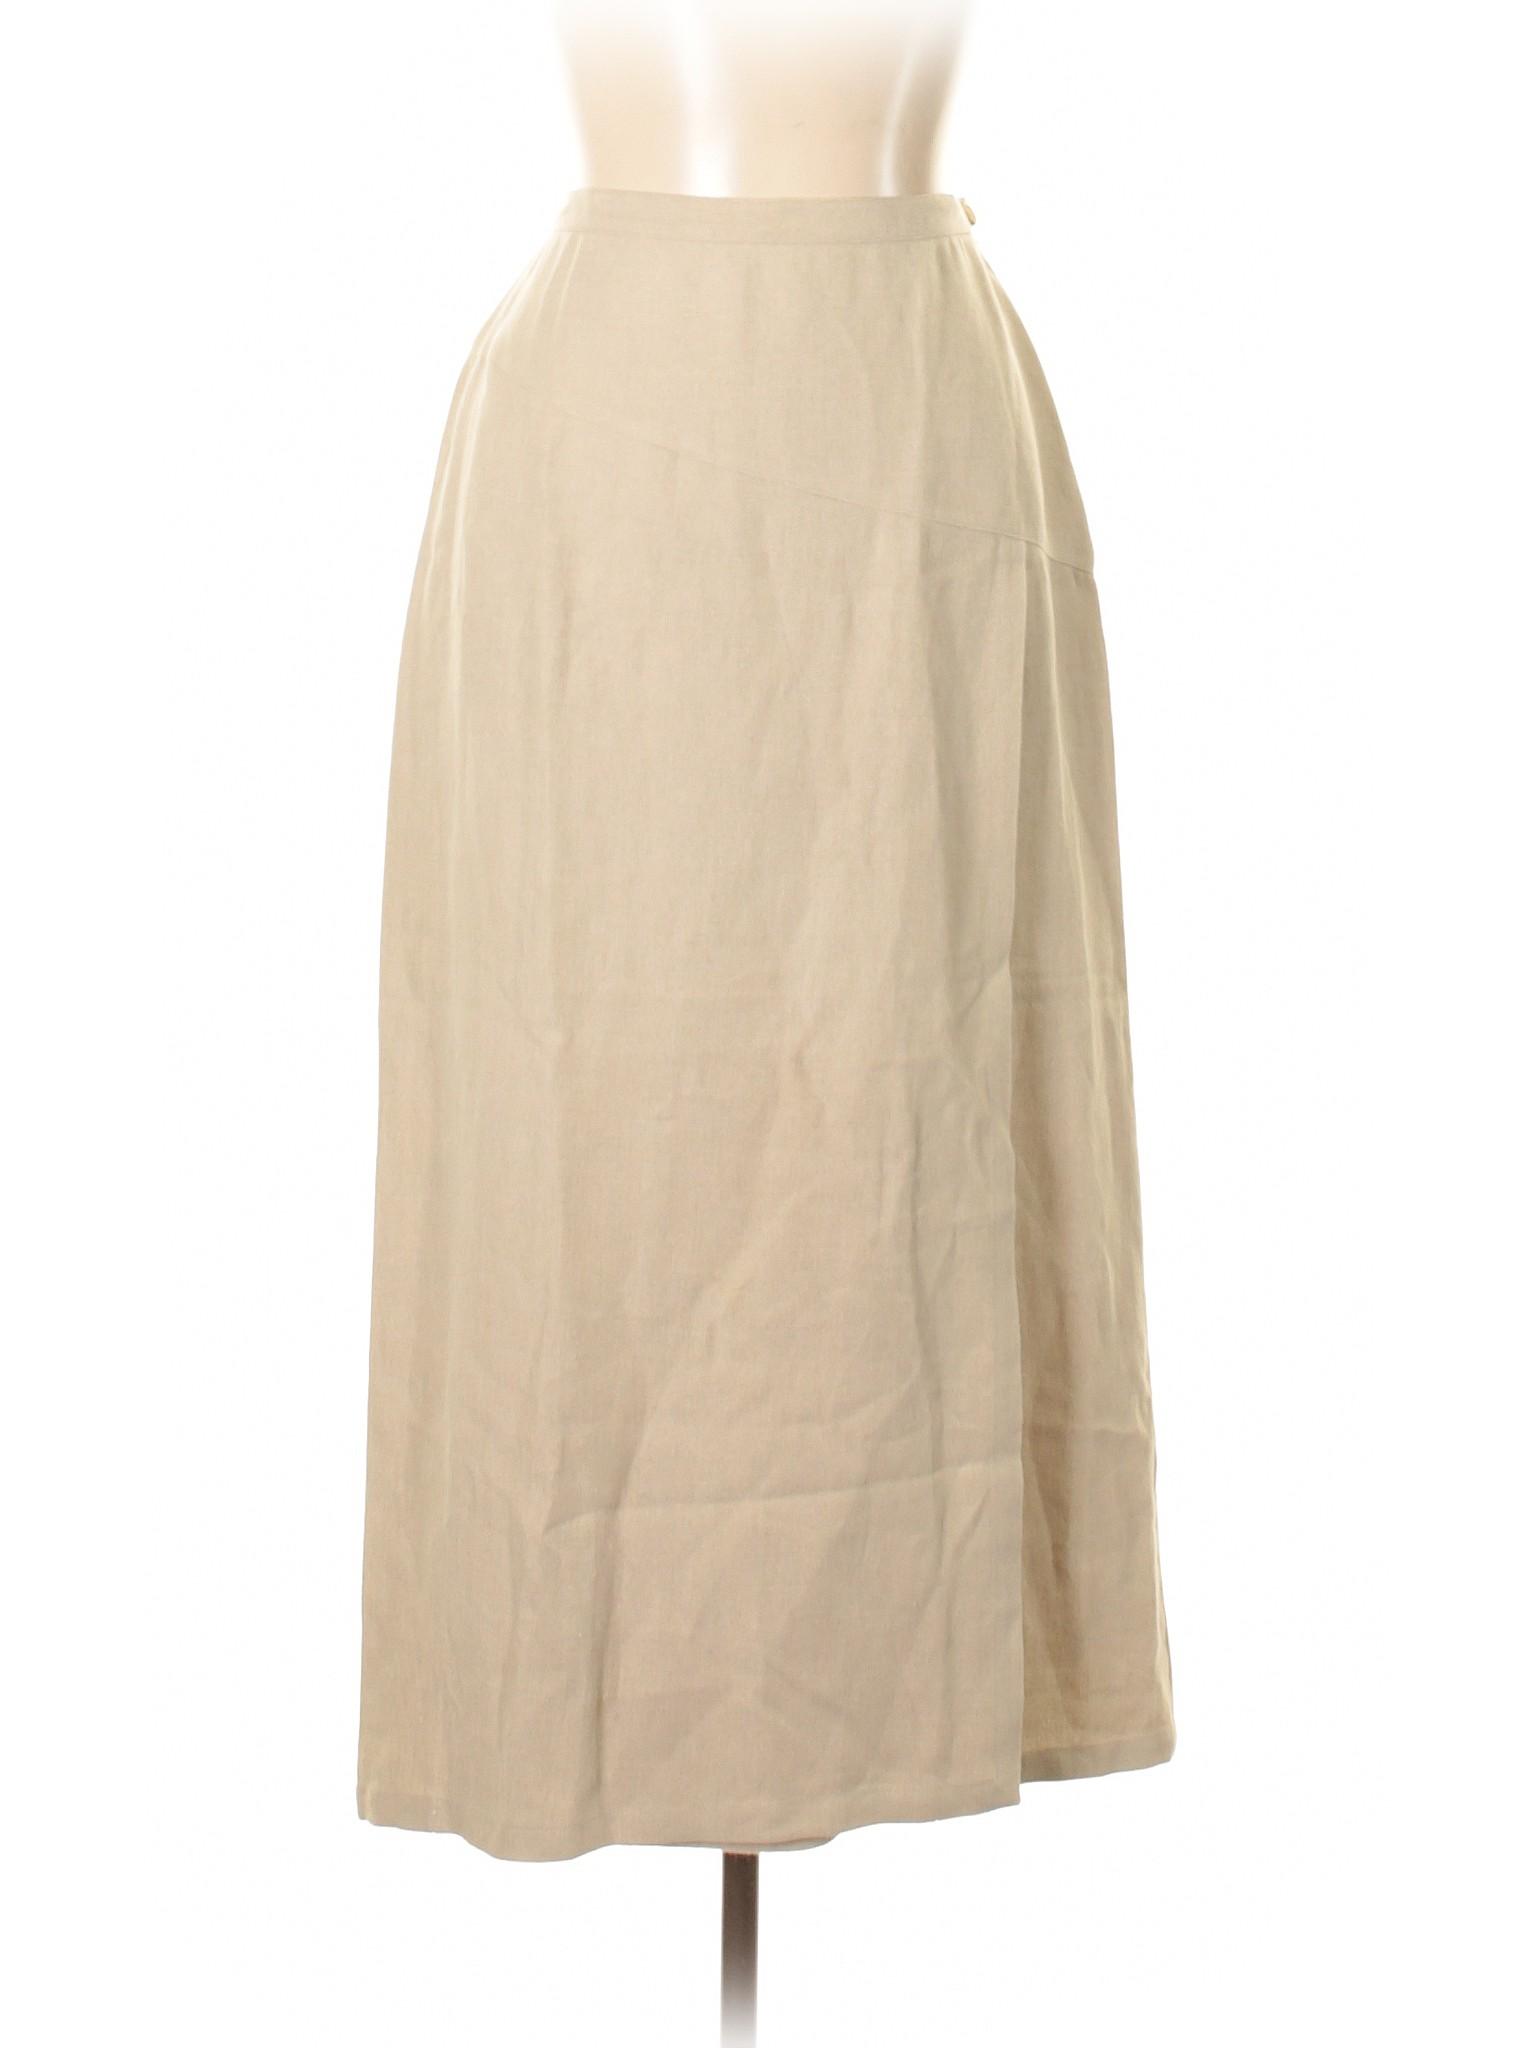 Casual Casual Skirt Boutique Boutique Skirt Boutique Casual Boutique Skirt 0qZUxHw